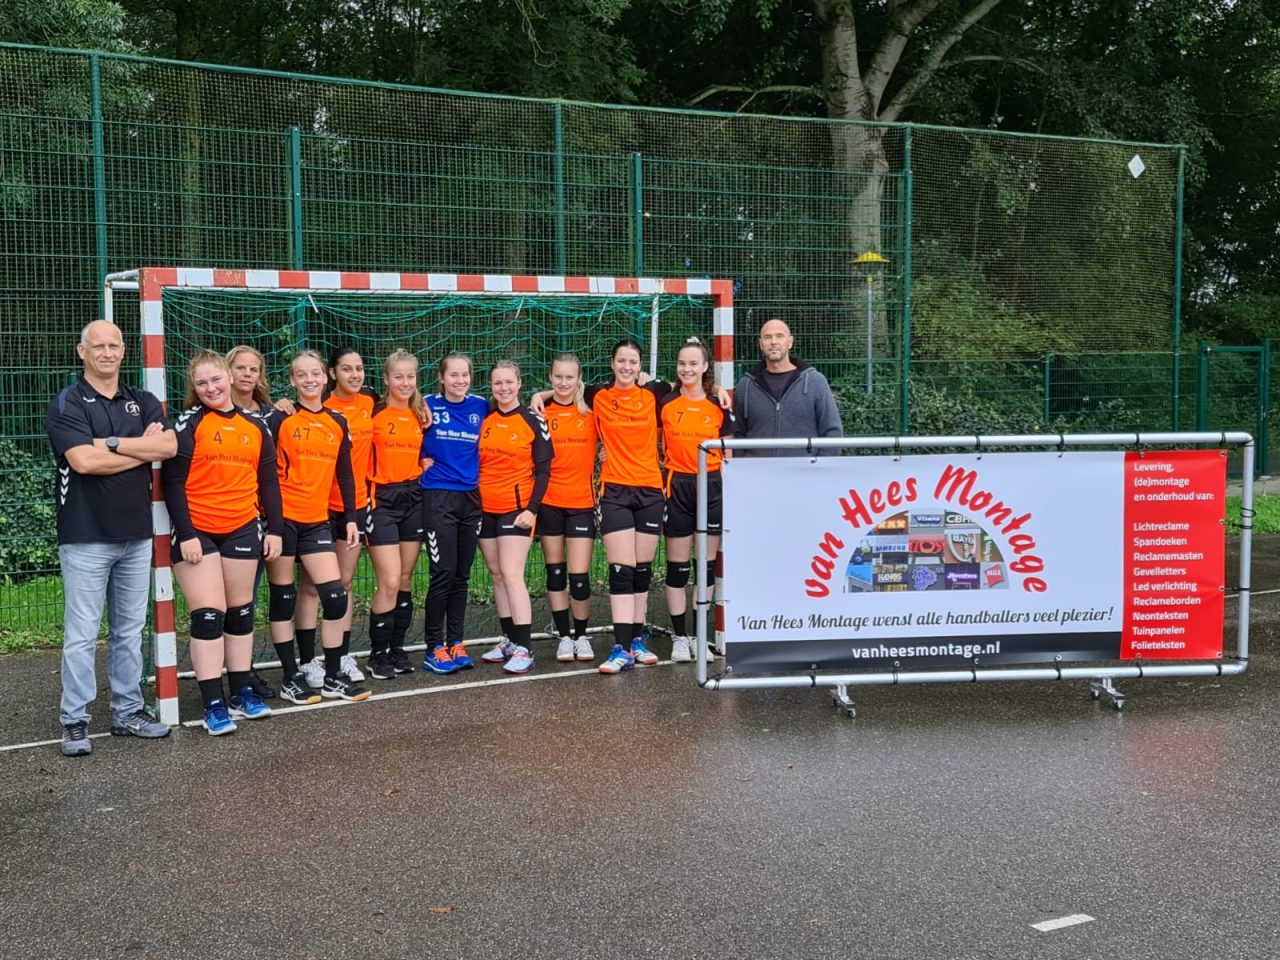 https://www.handbalvereniginglelystad.nl/wp-content/uploads/2020/09/WhatsApp-Image-2020-09-27-at-09.43.10-1280x960.jpeg